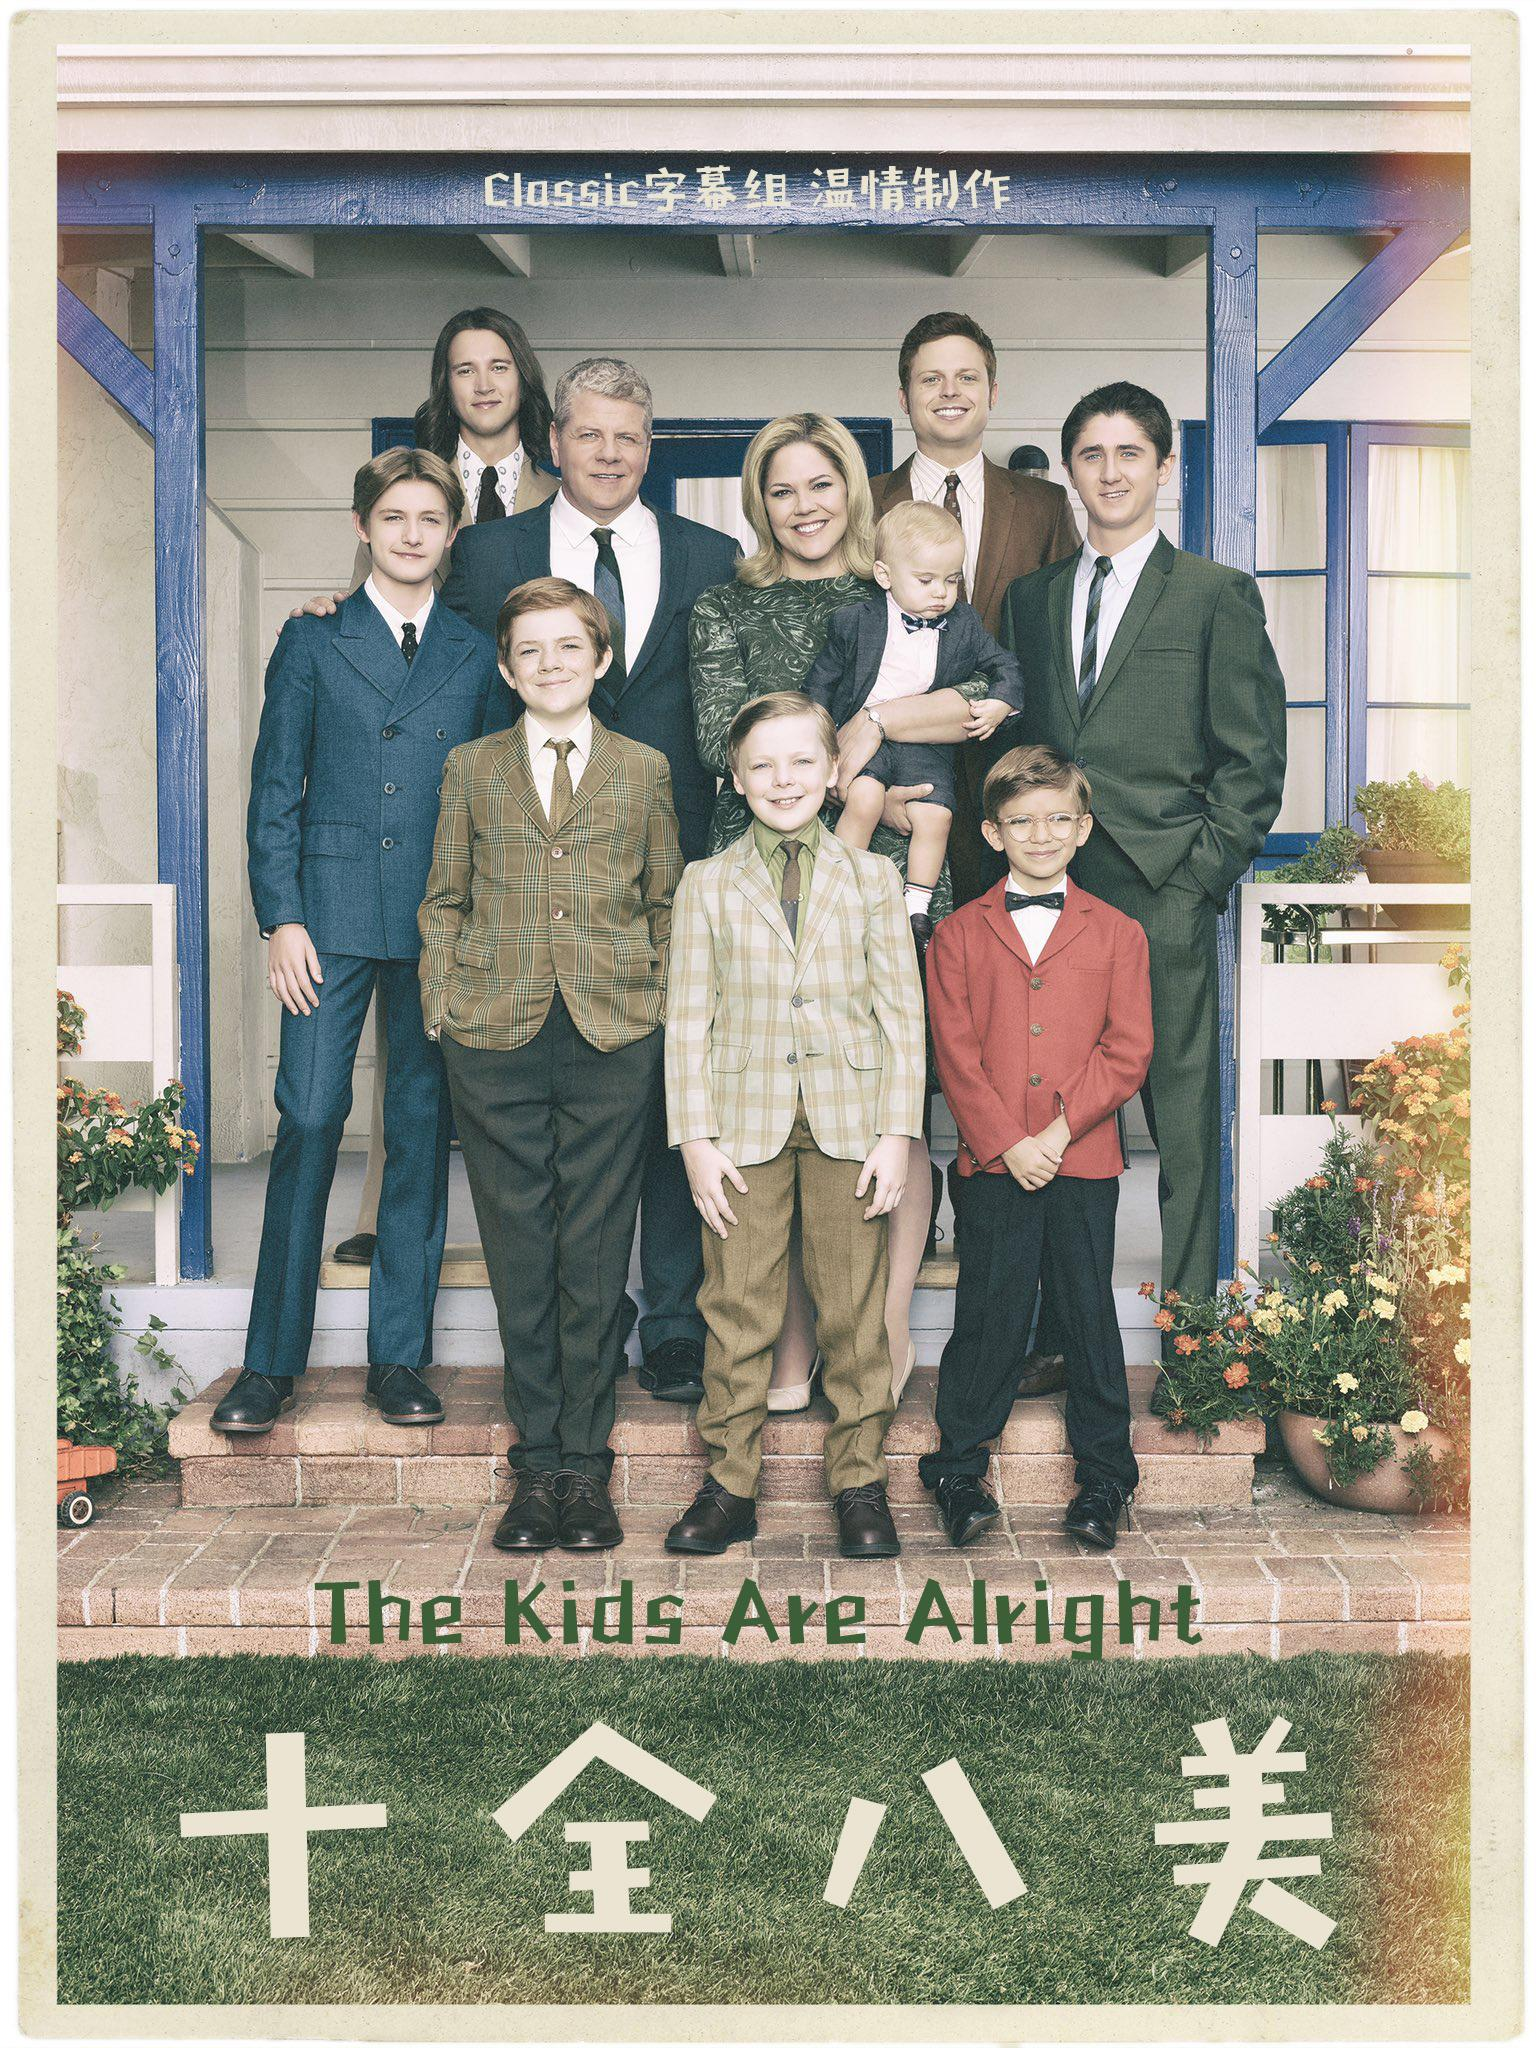 十全八美/吾孩尚可 The Kids Are Alright (2018)百度云迅雷下载